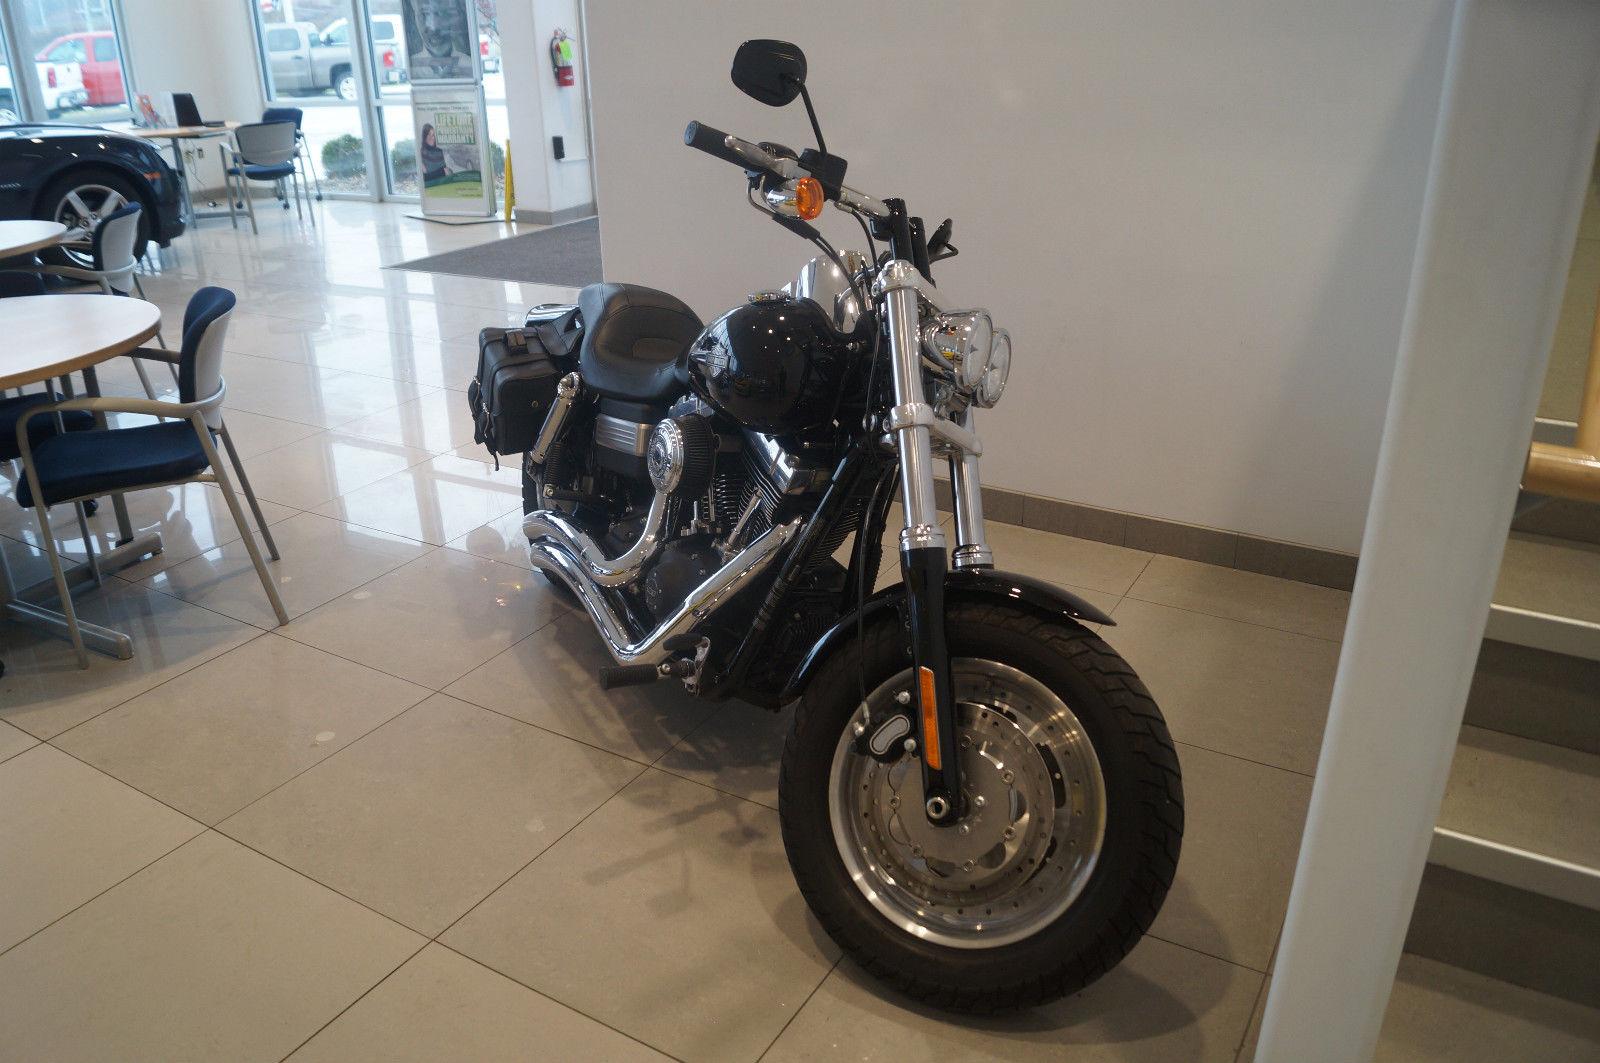 2012 12 Harley Davidson Fatbob Fat Bob Dyna Motorcycle